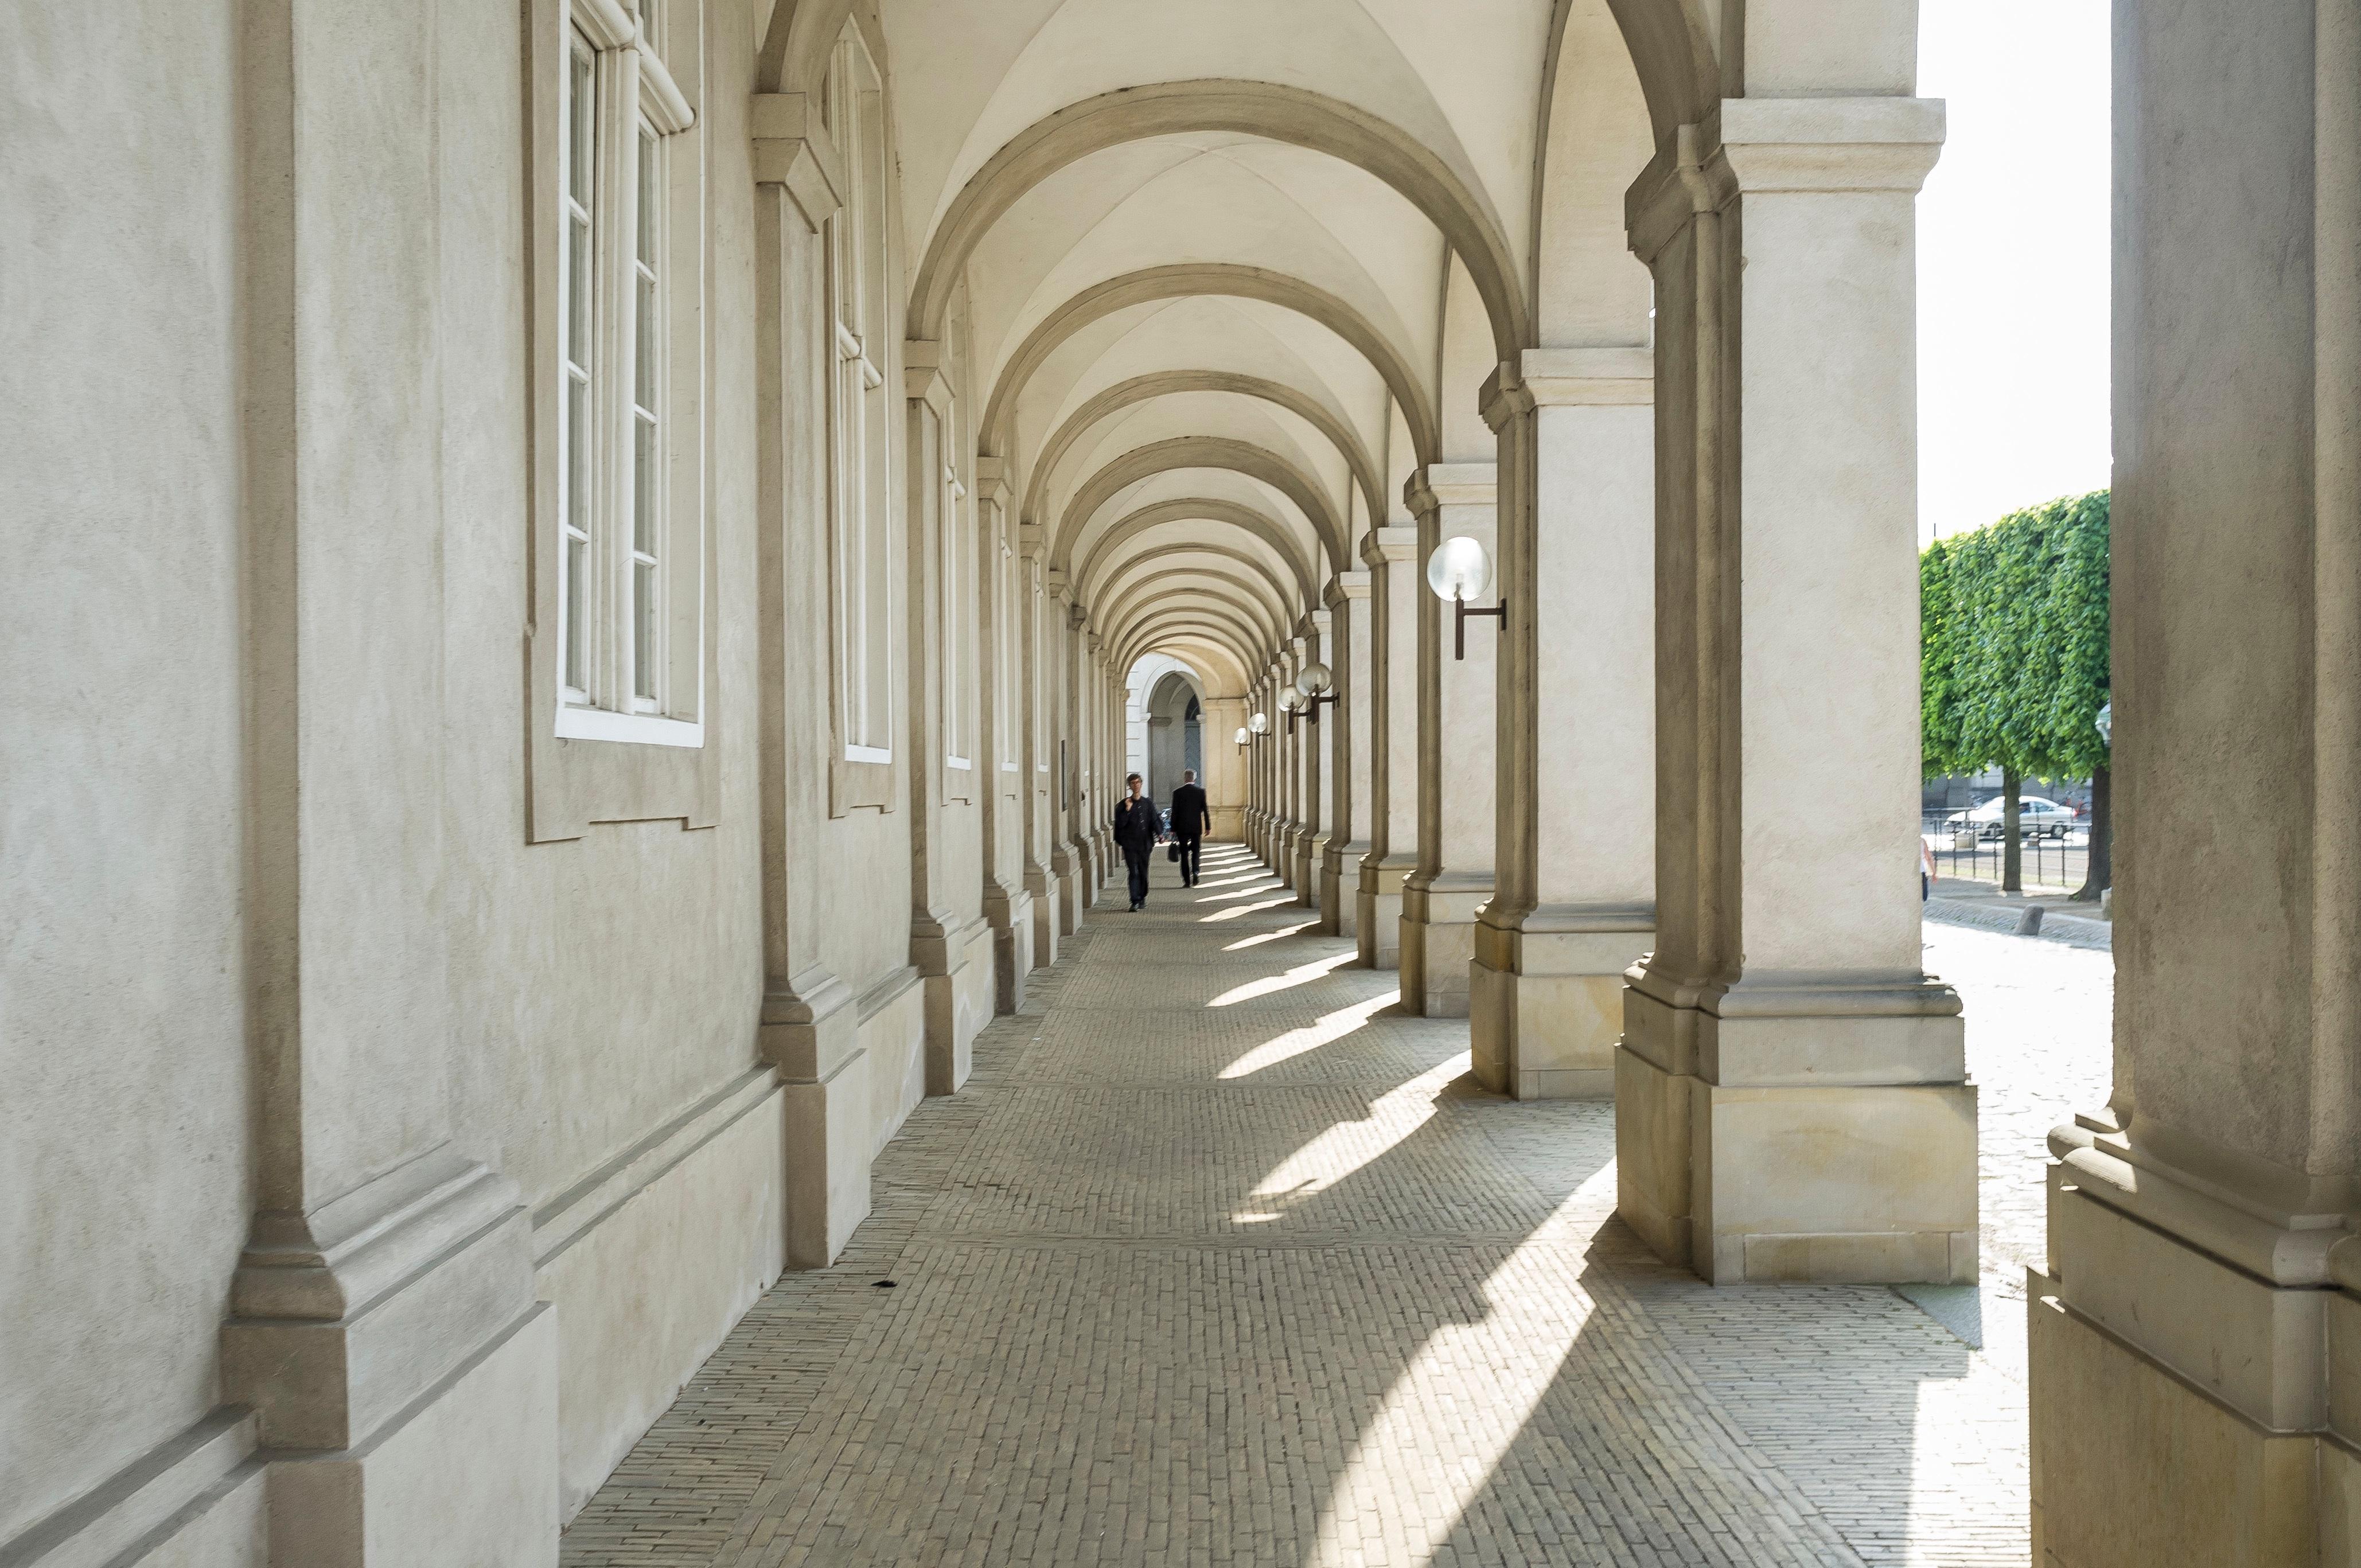 Fotos gratis arquitectura estructura arco columna for Diseno pasillos interiores